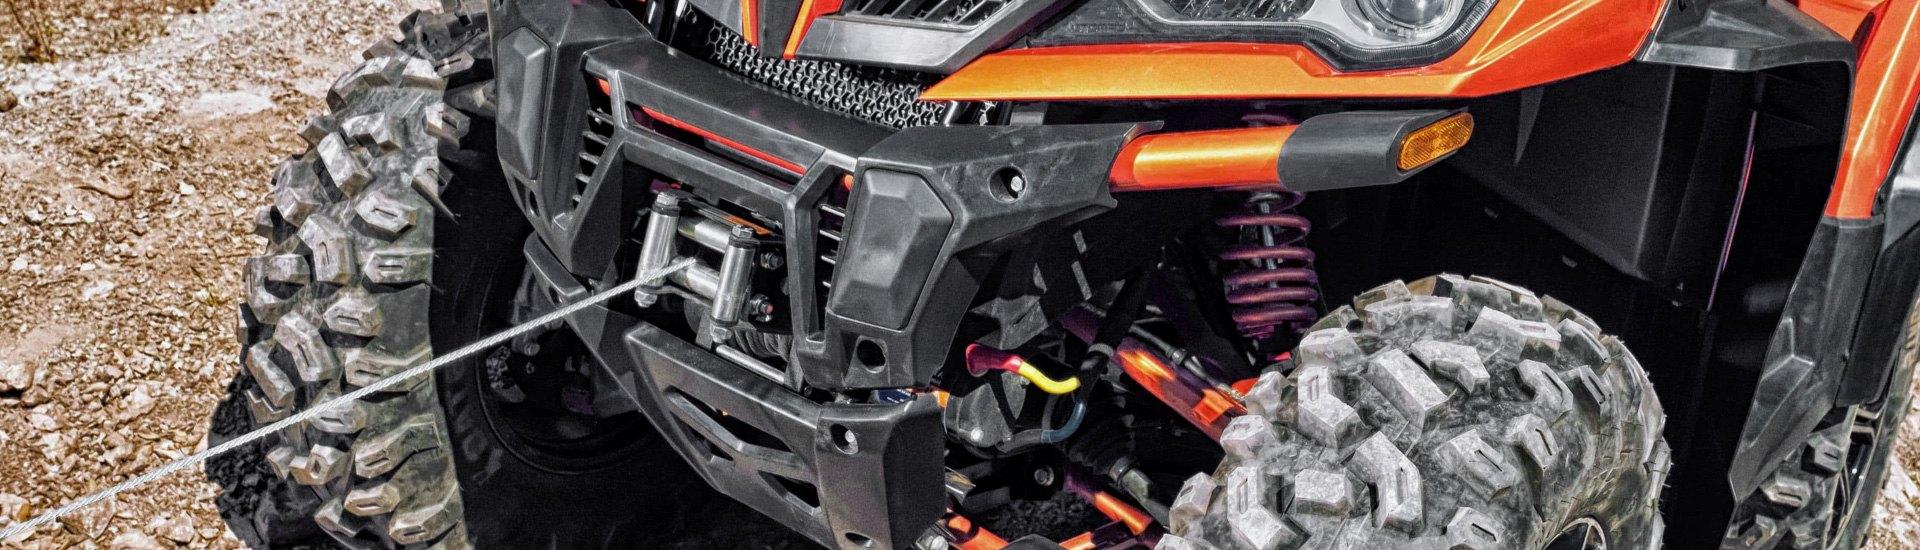 Hmf Iq Front Bumper Yamaha Yfz450x